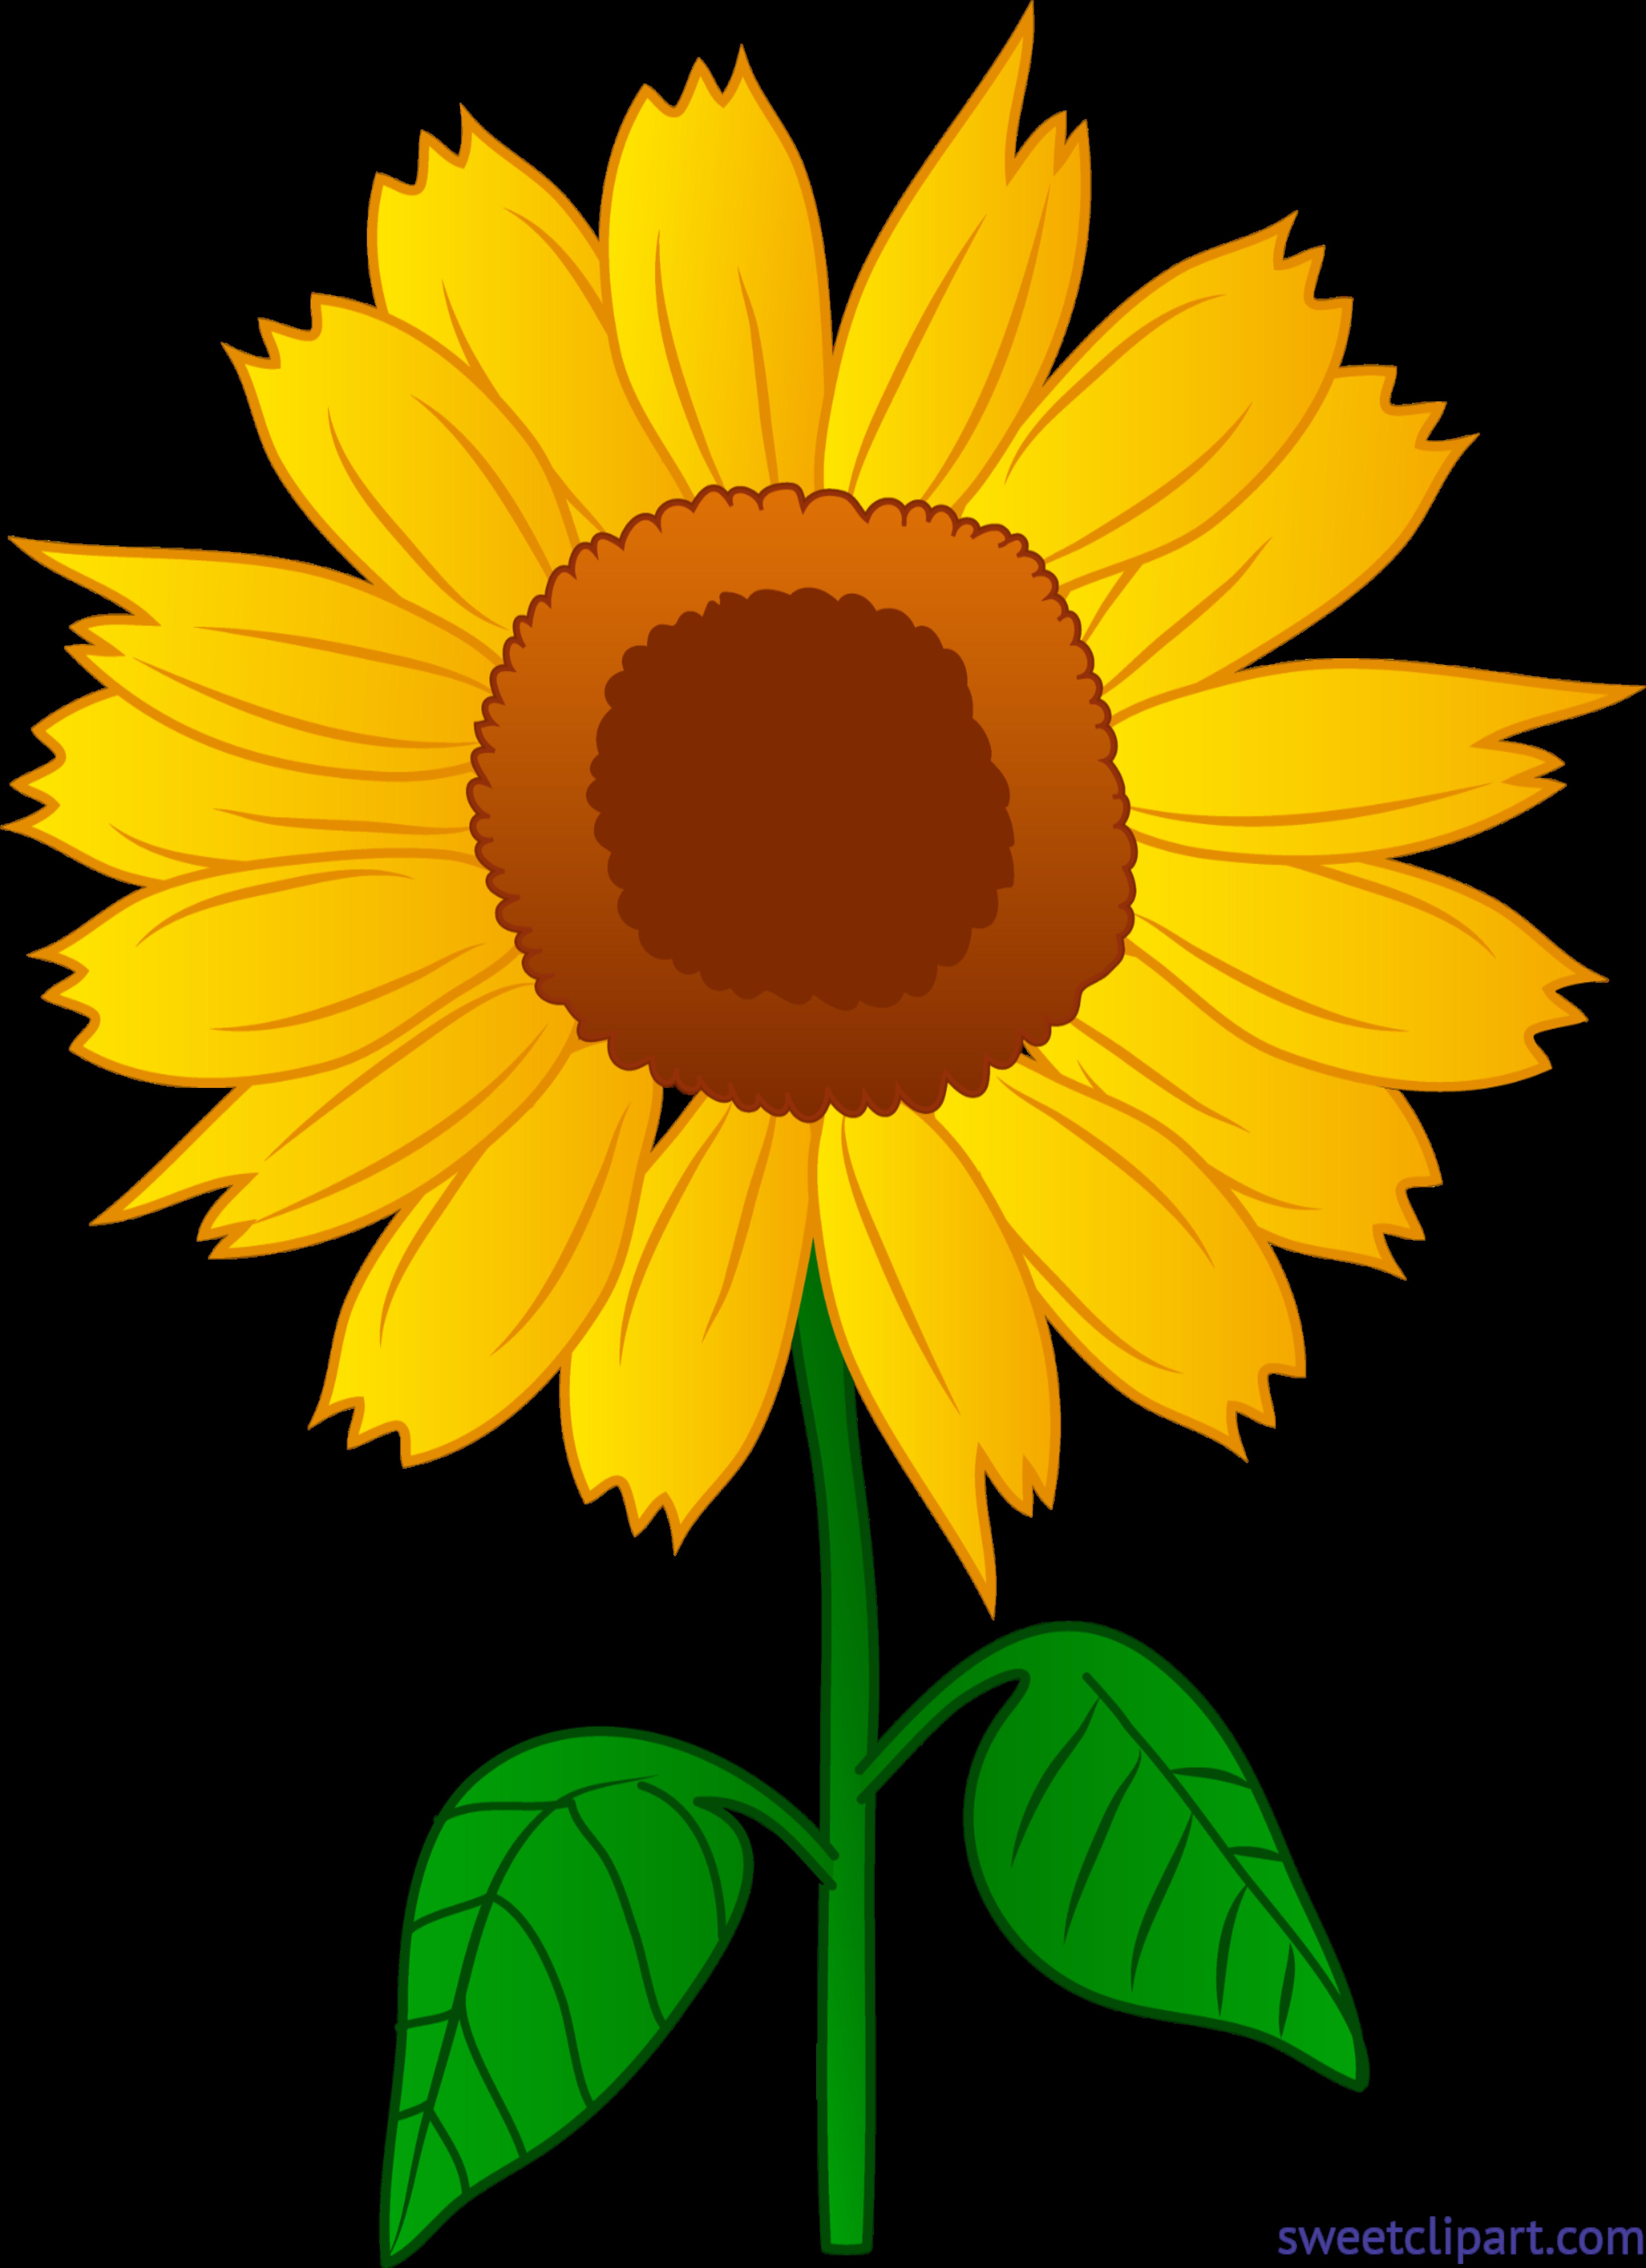 Clipart sun flower svg transparent stock Sunflower 2 Clip Art - Sweet Clip Art svg transparent stock